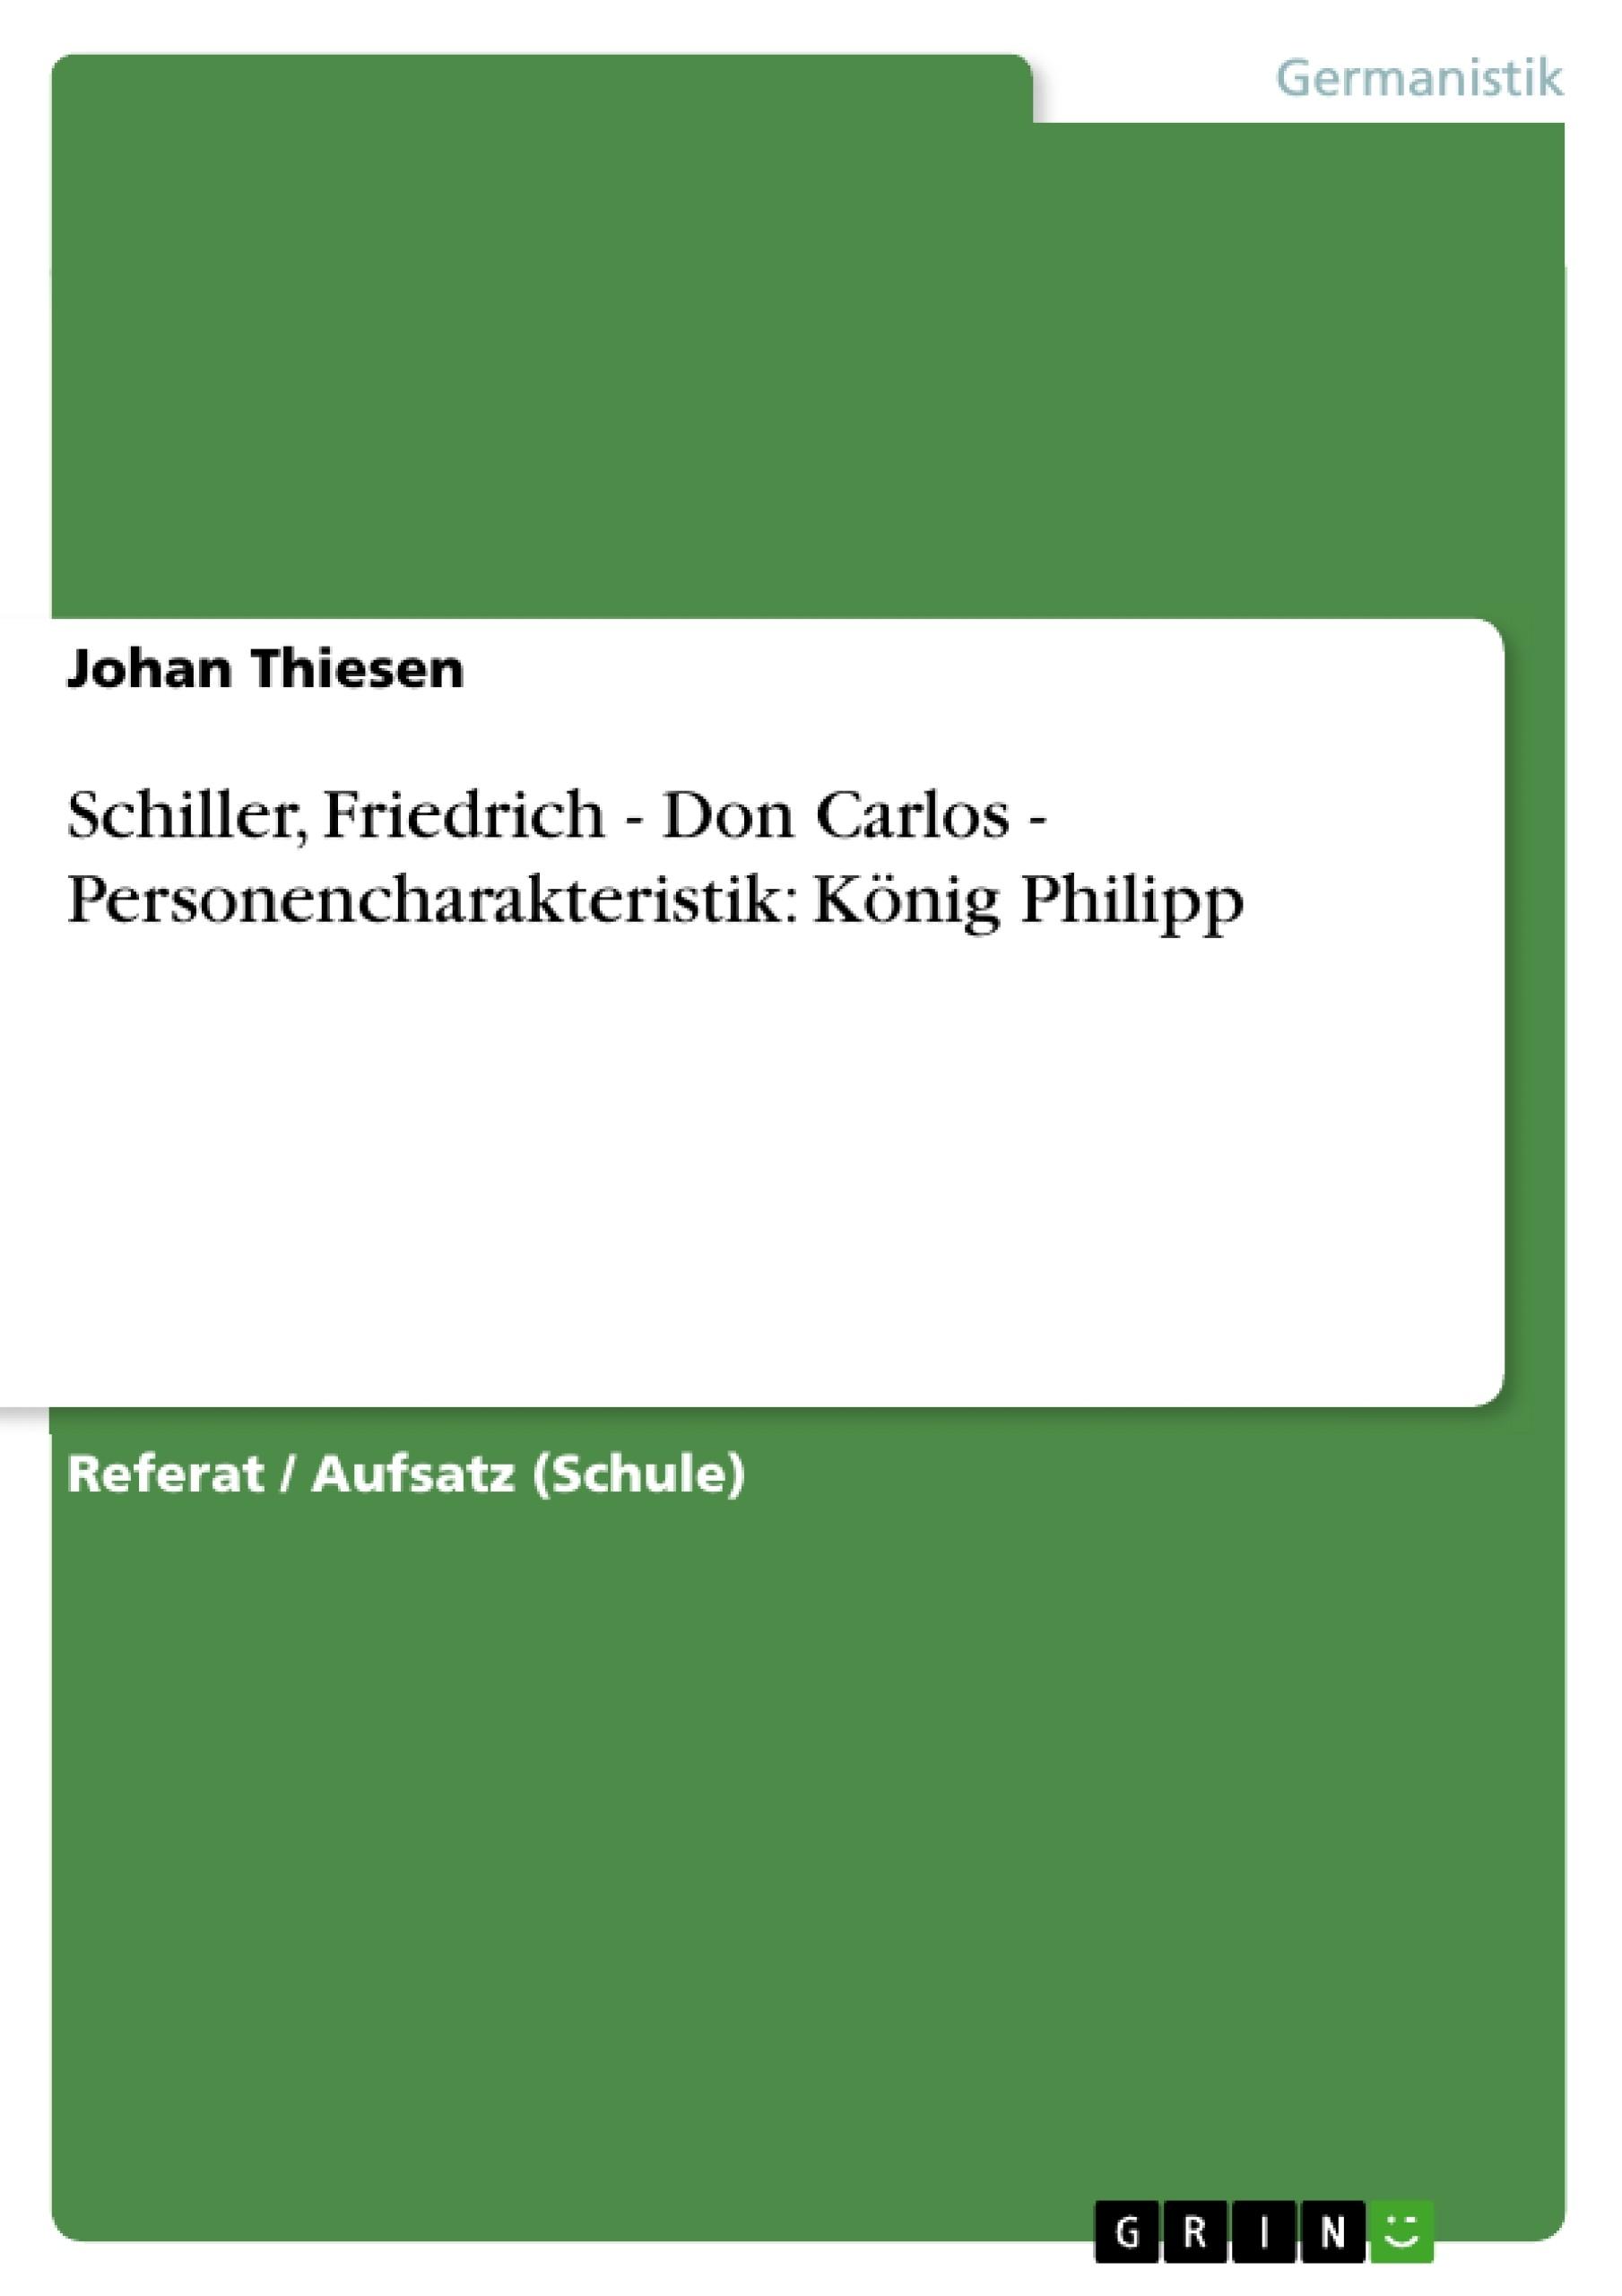 Titel: Schiller, Friedrich - Don Carlos - Personencharakteristik: König Philipp